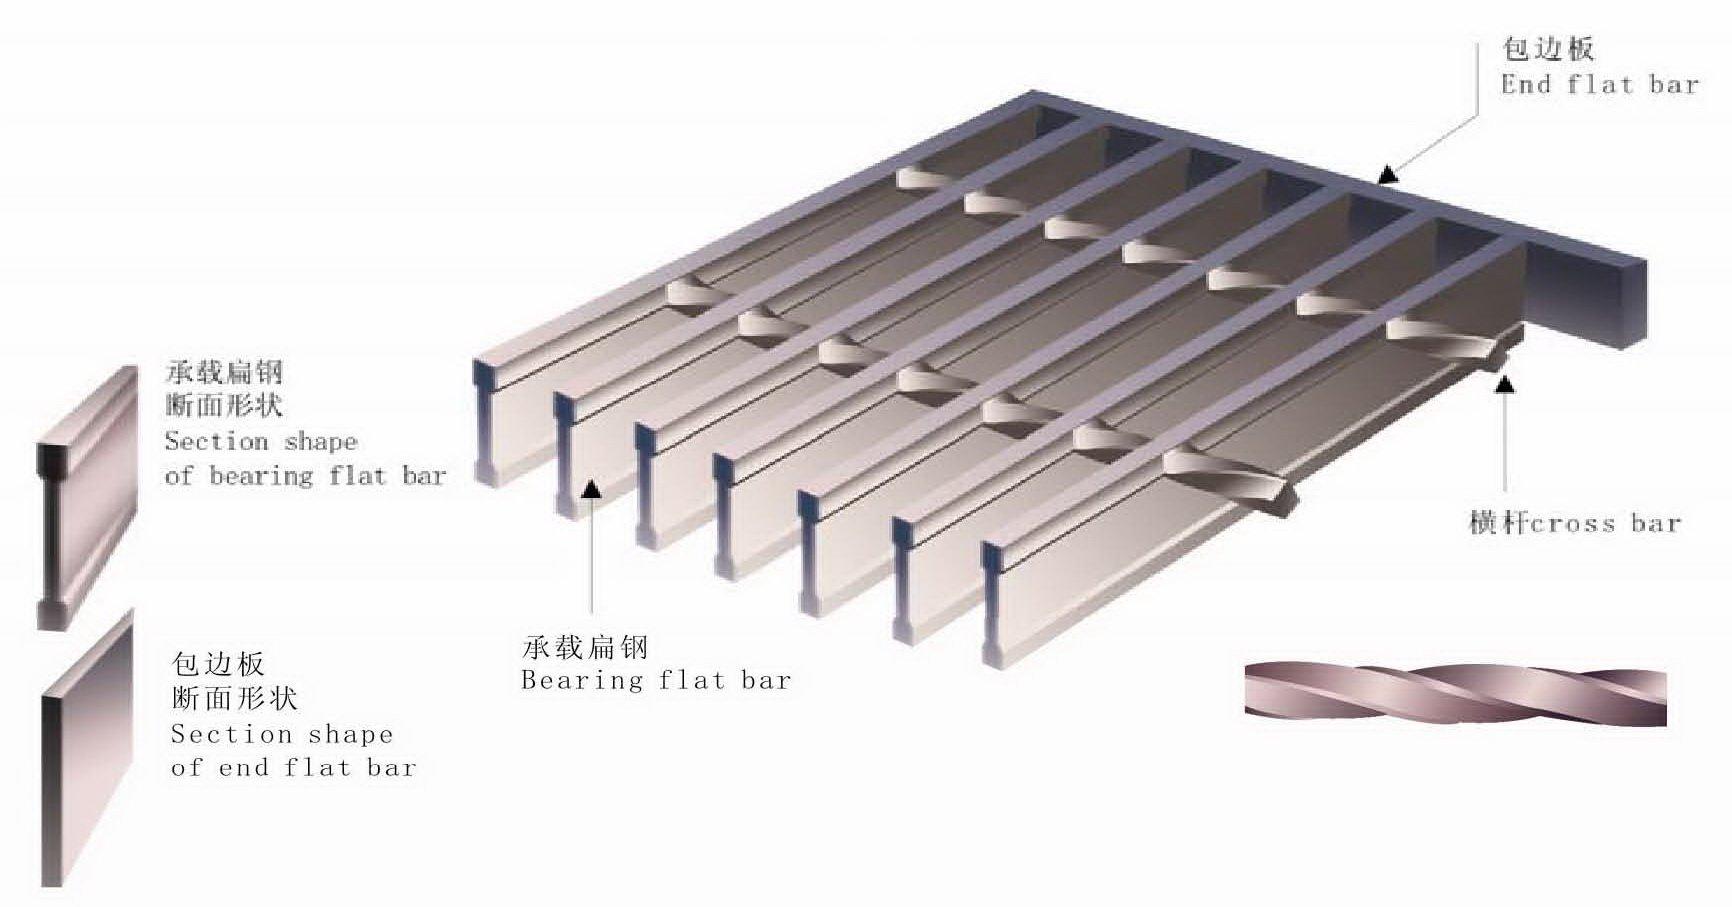 Steel Floor Grating Dimensions on Lennar Homes Floor Plans